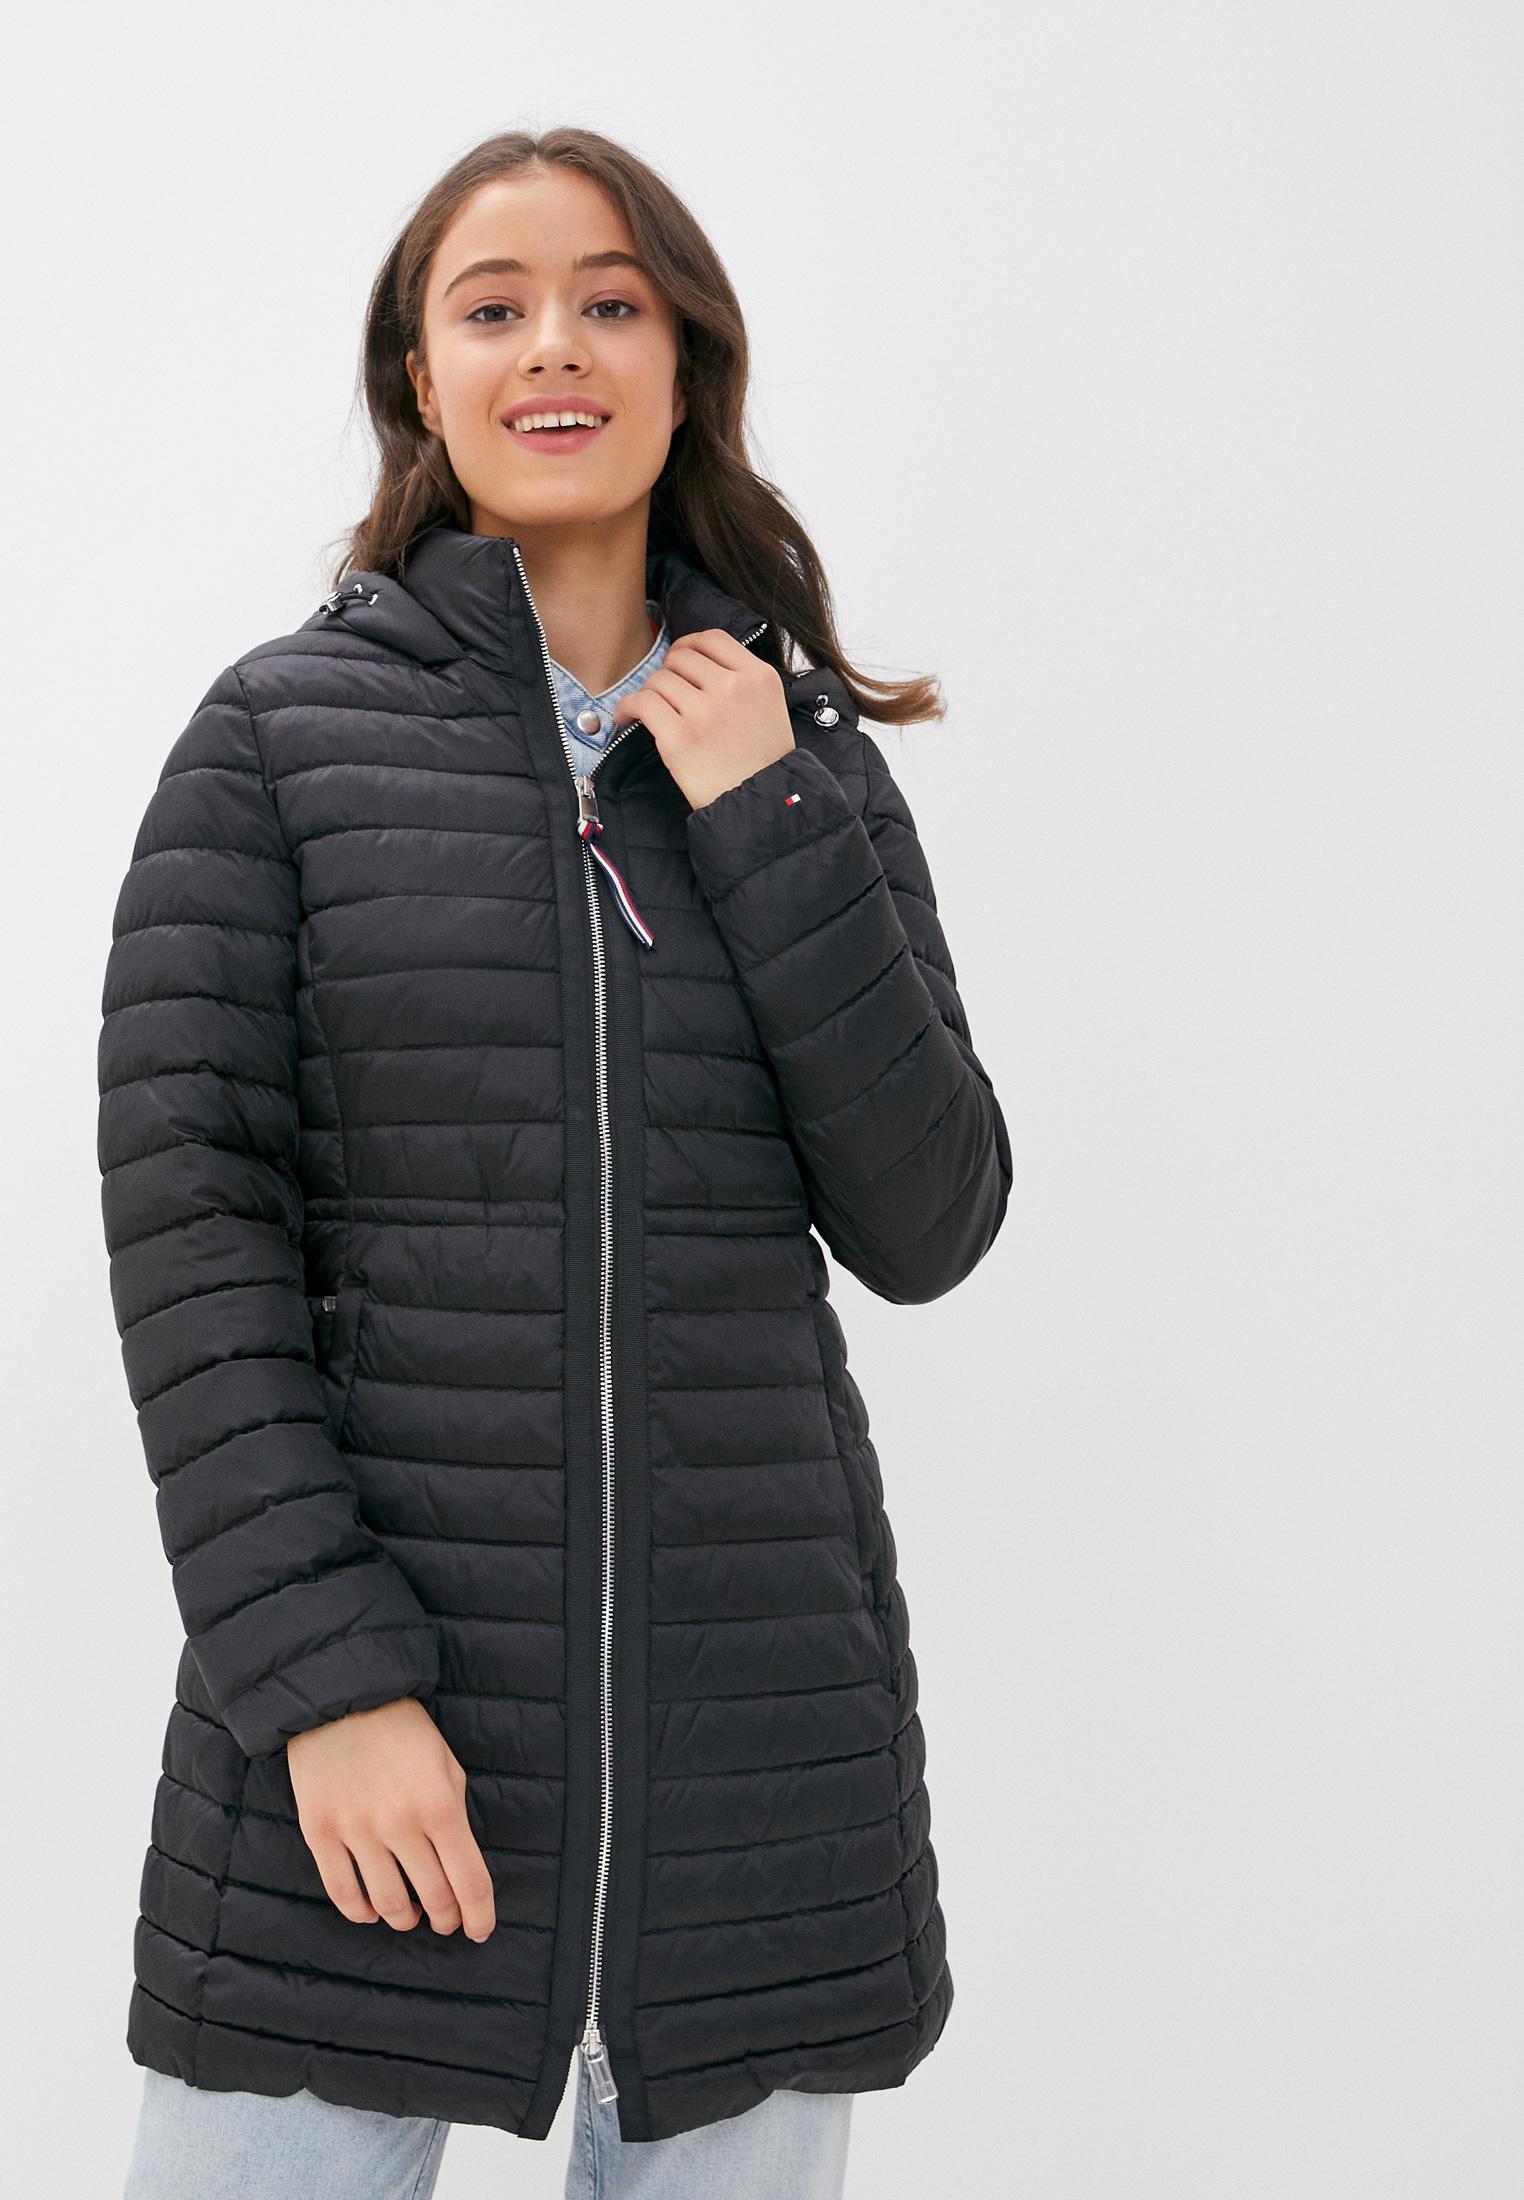 Утепленная куртка Tommy Hilfiger (Томми Хилфигер) WW0WW28430